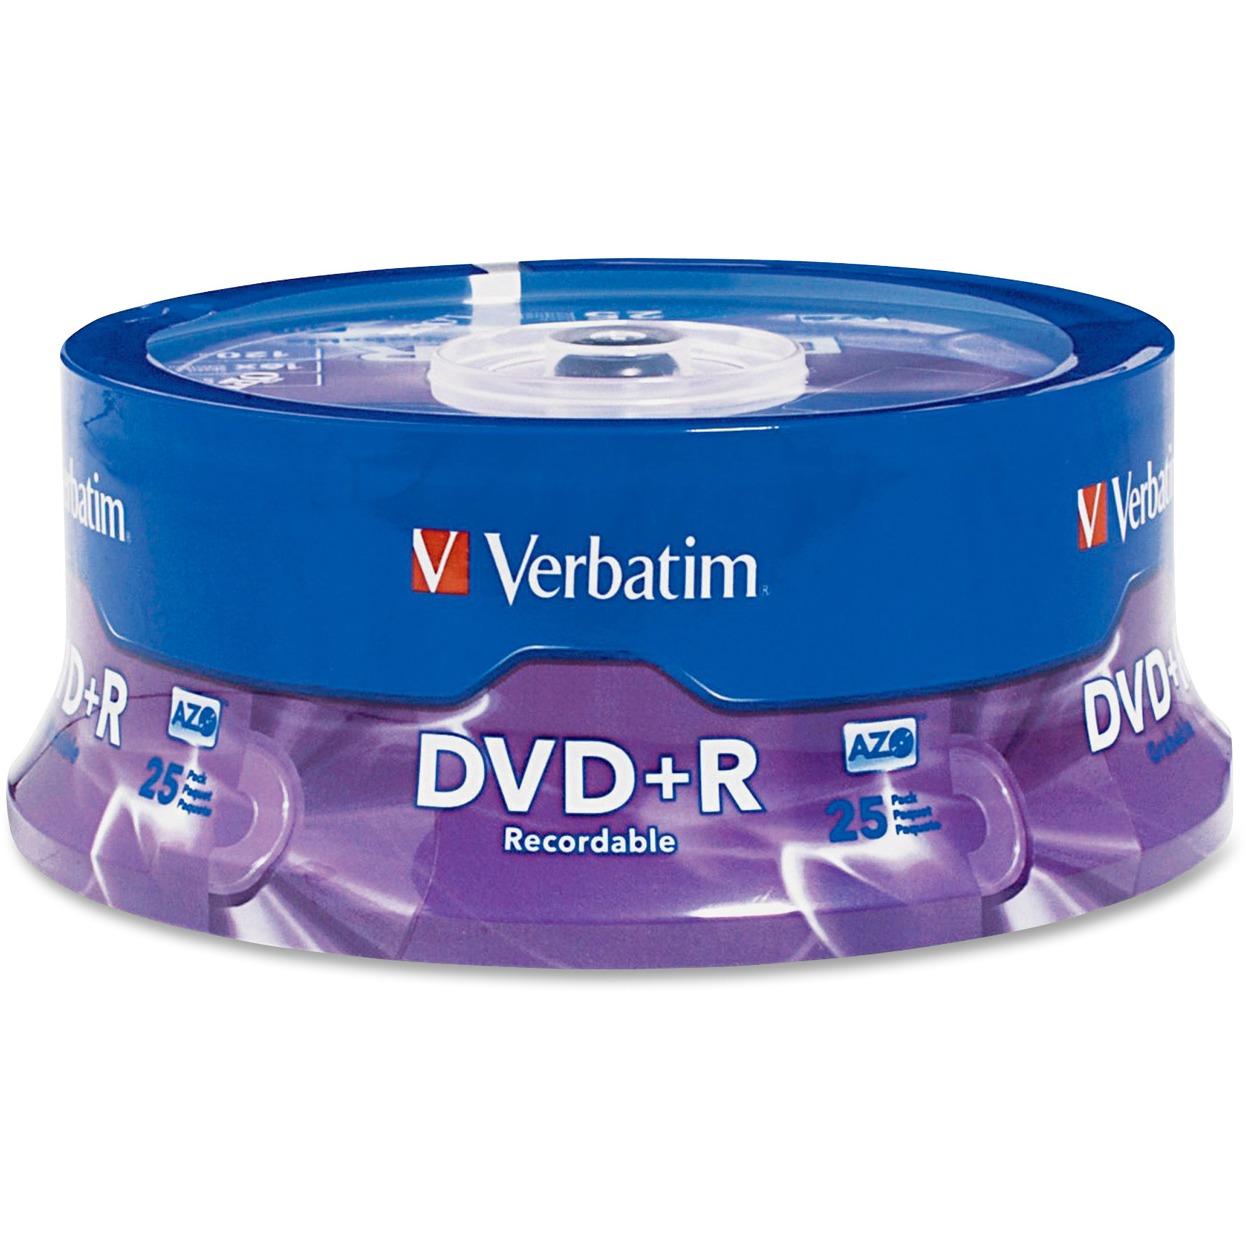 Verbatim, VER95033, 4.7GB AZO DVD+R, 25